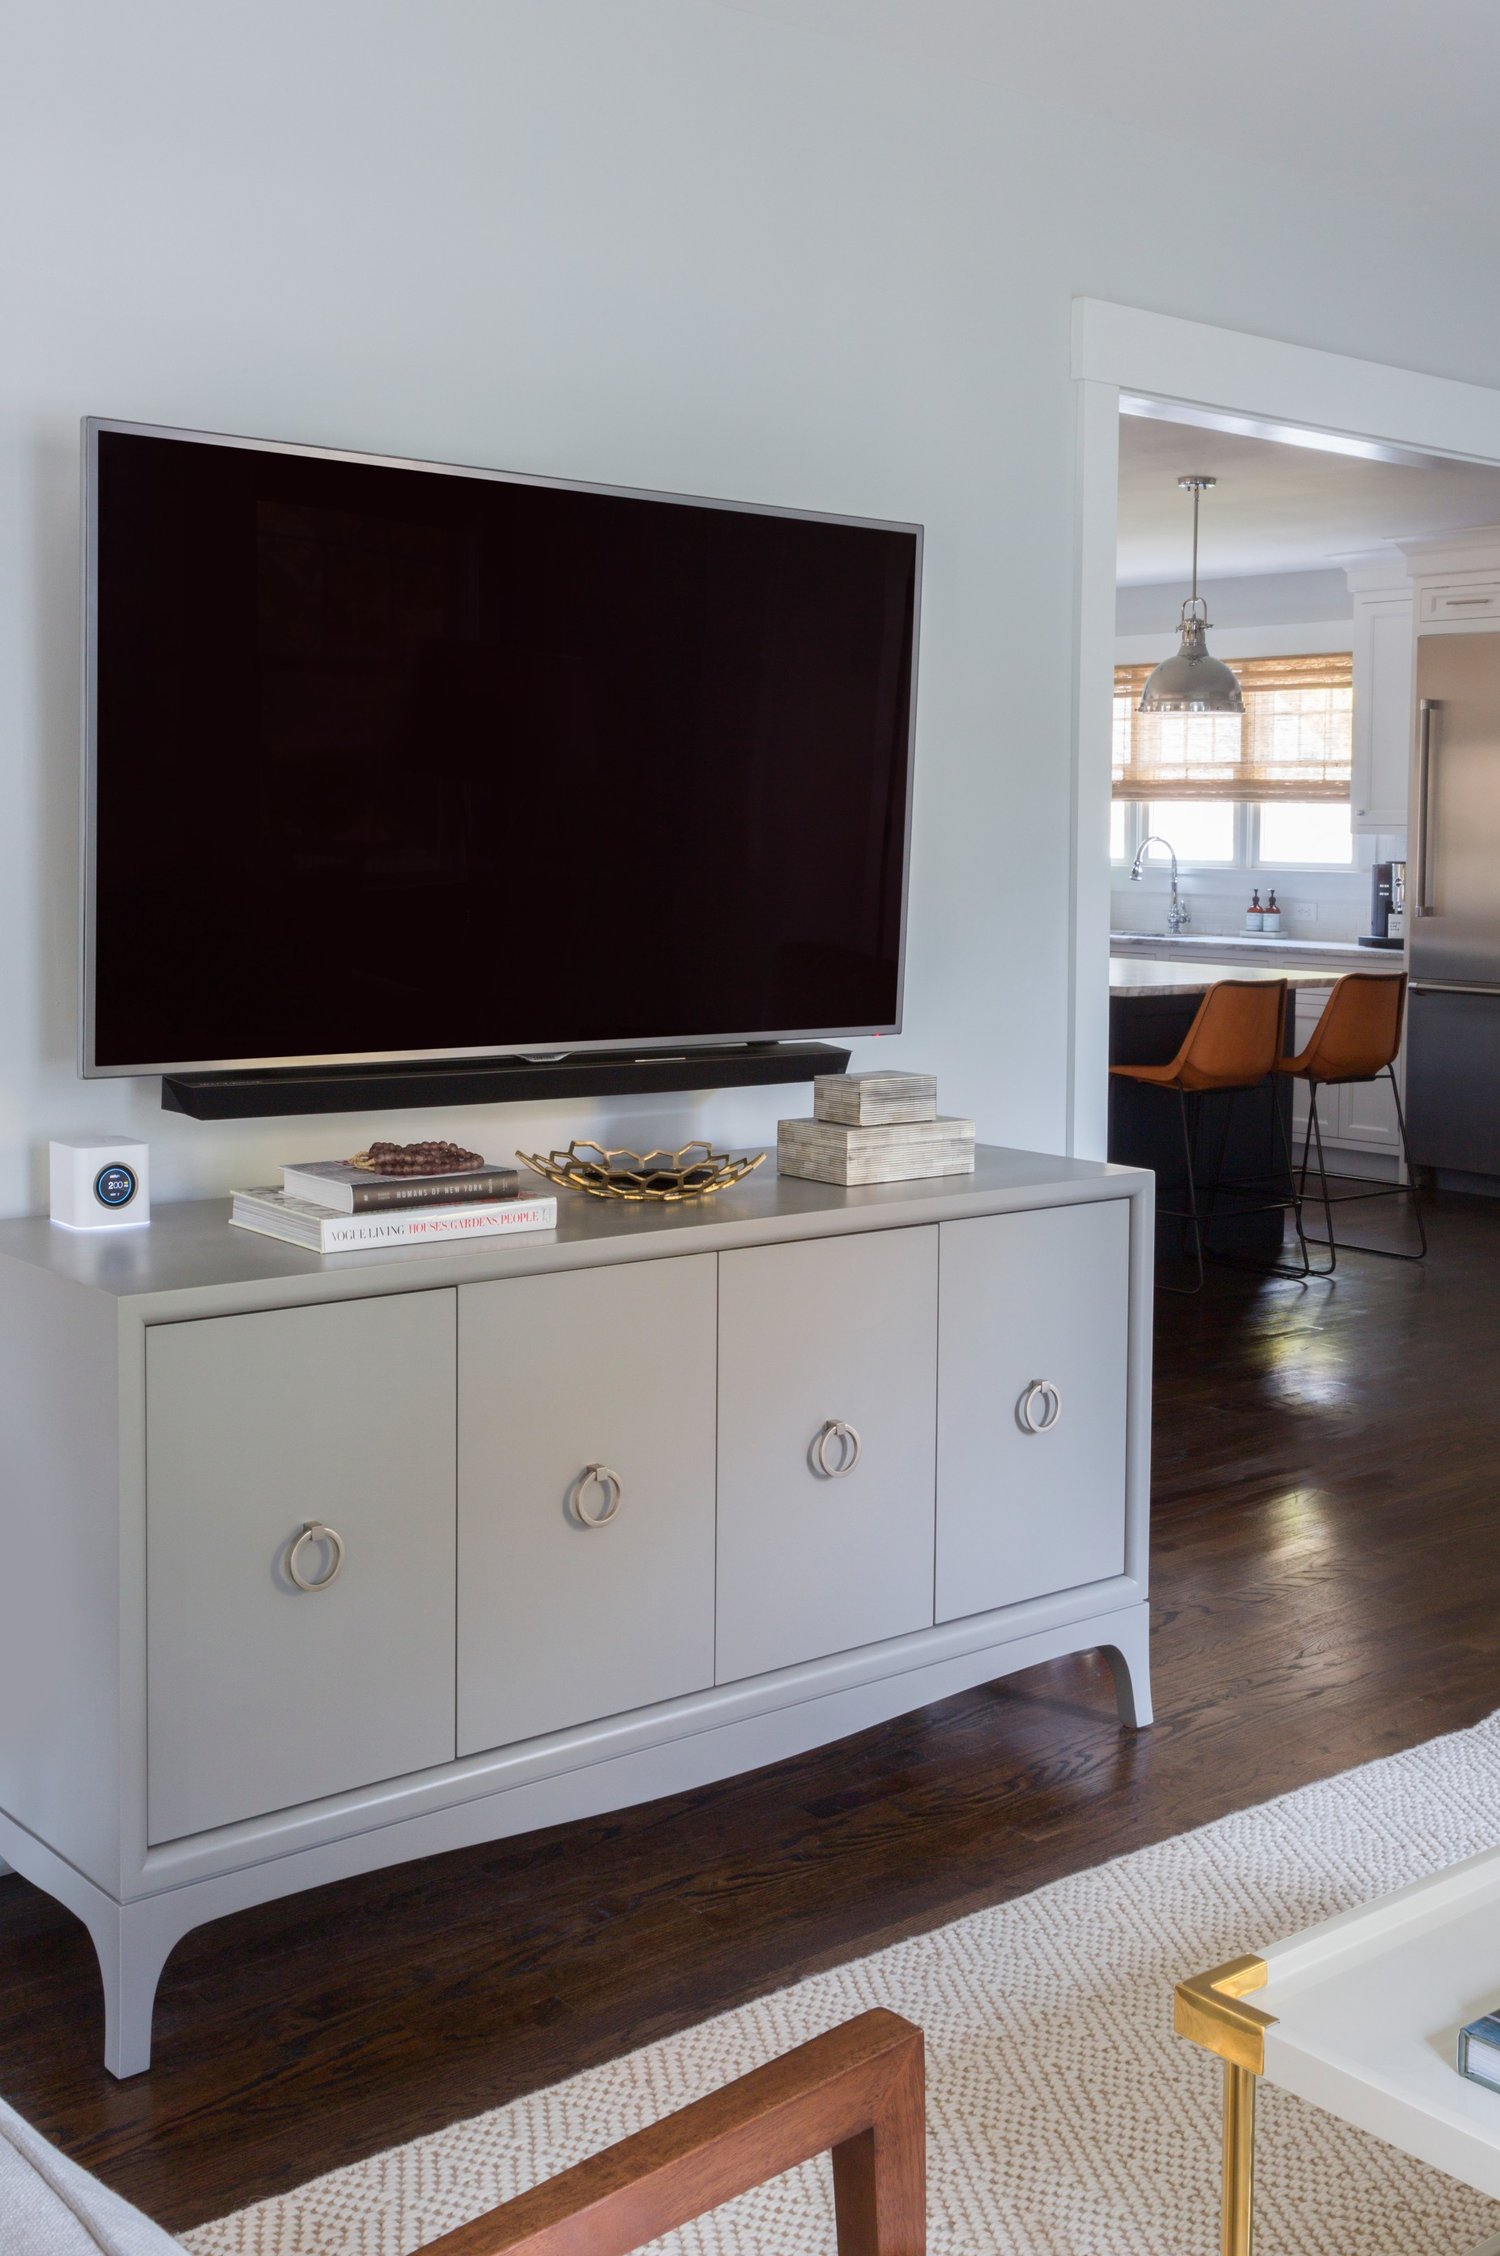 Flat screen TV above grey hutch